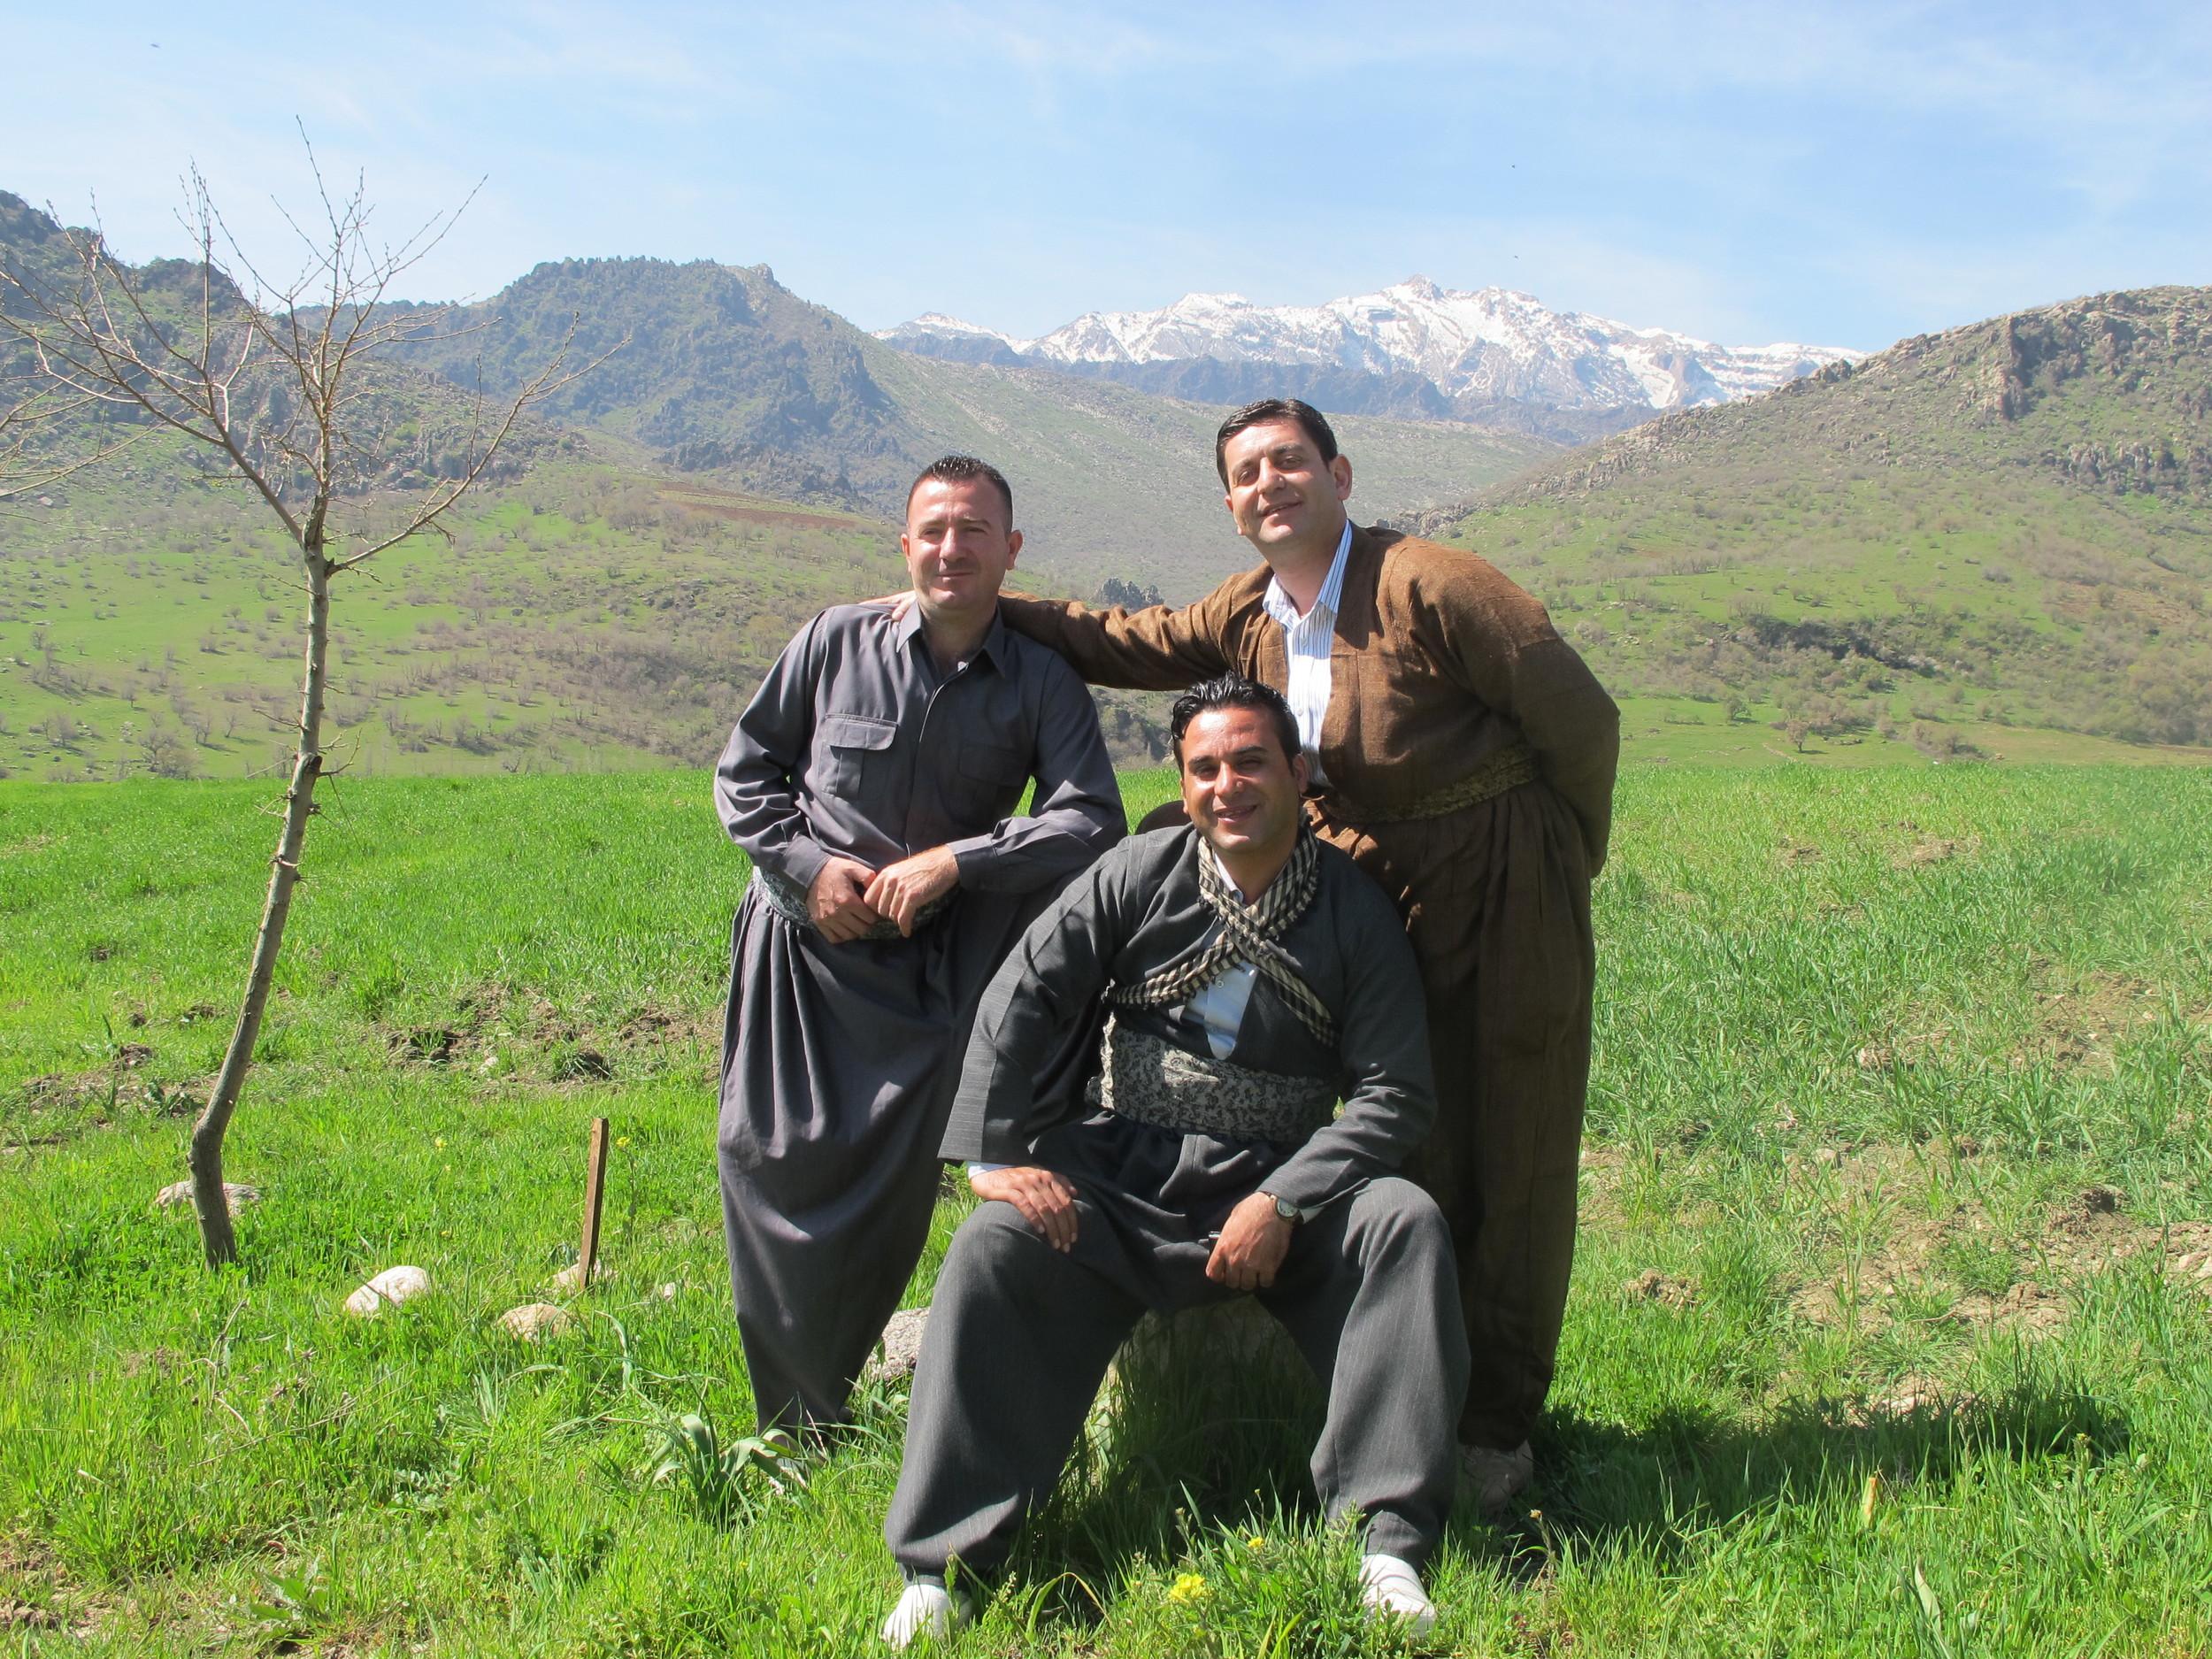 Men in traditional Kurdish dress celebrate Nowruz